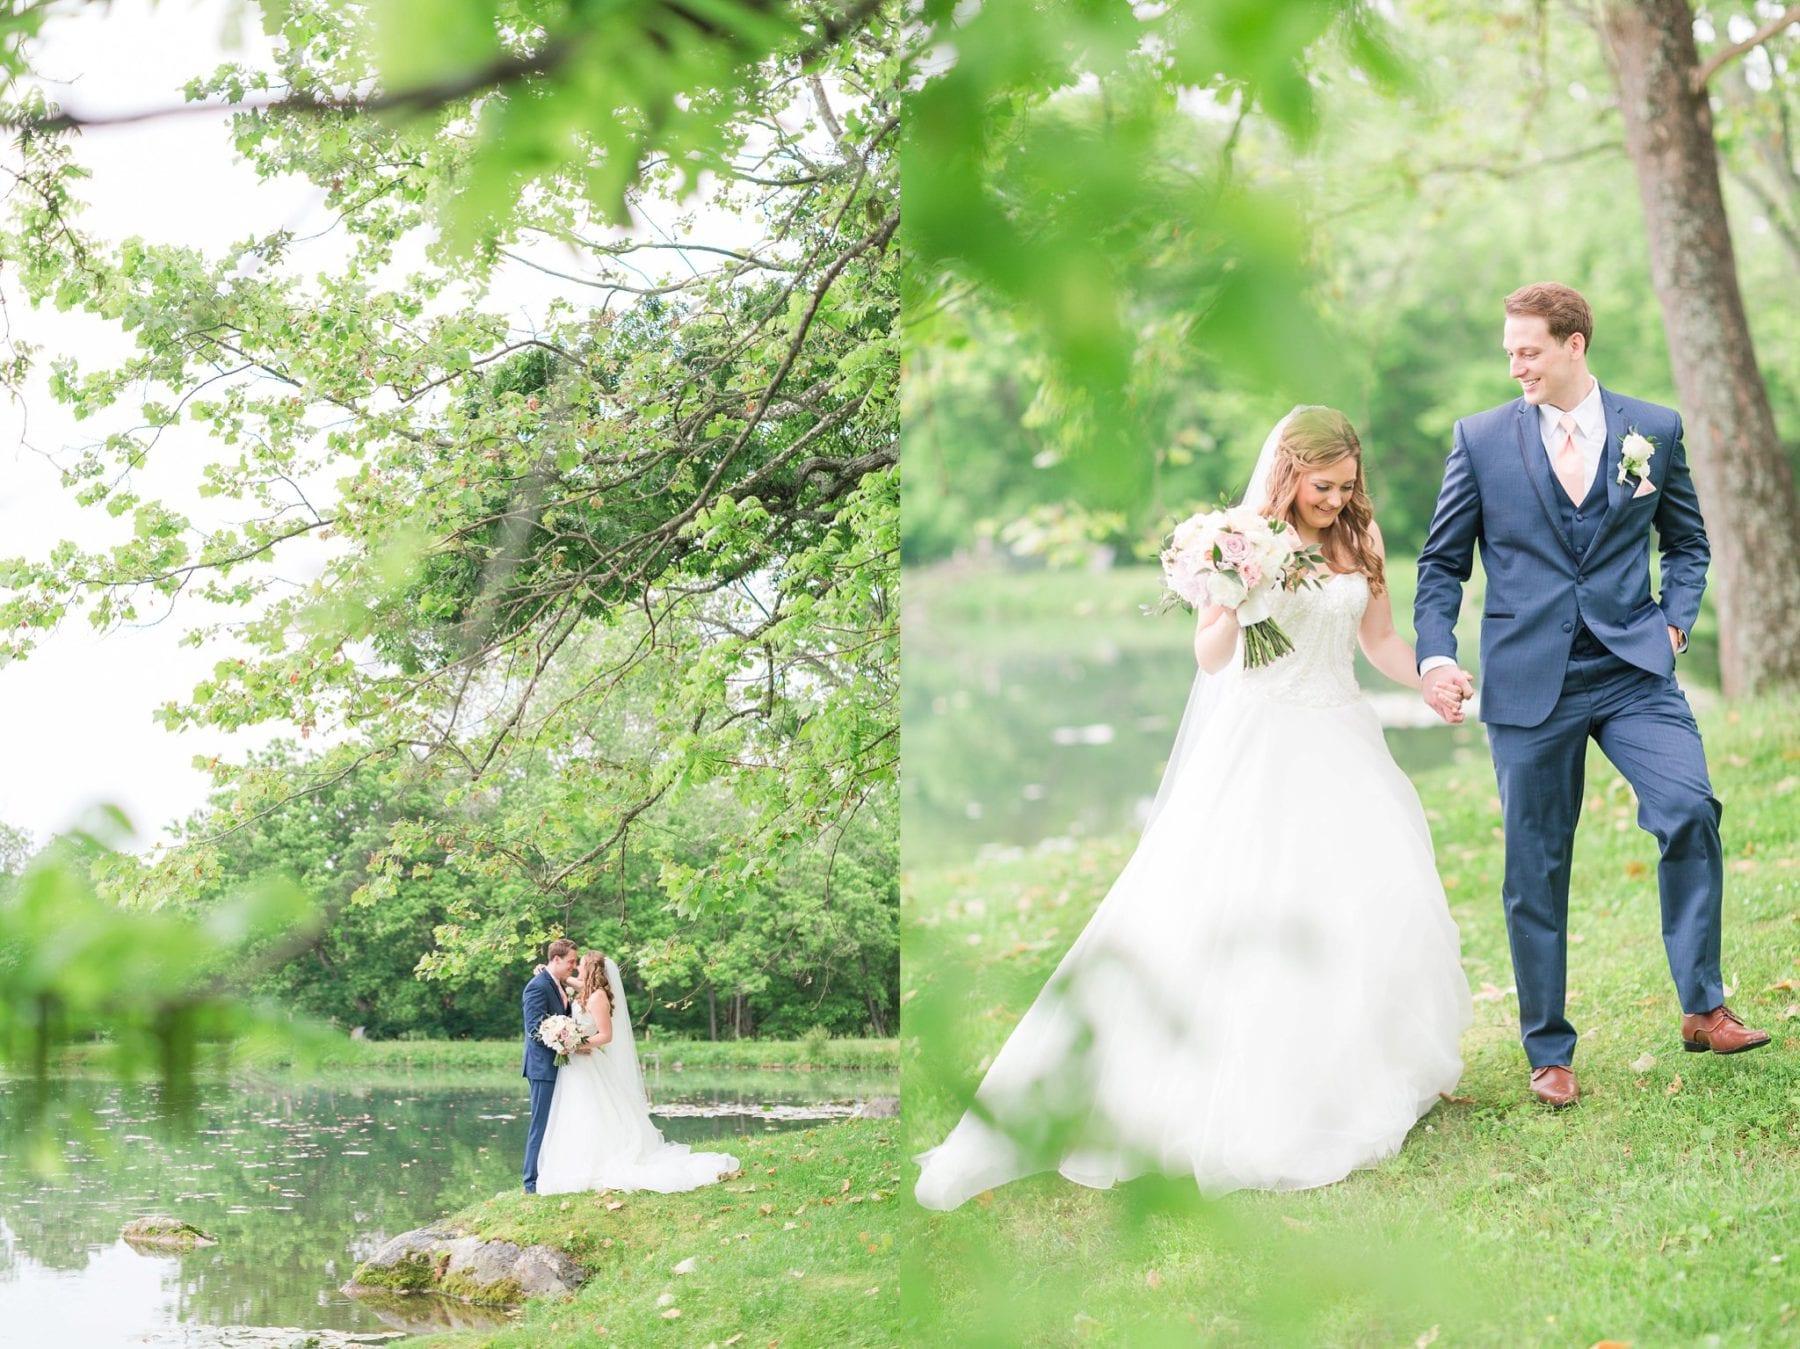 Justin & Megan Big Spring Farm Wedding Photos-196.jpg